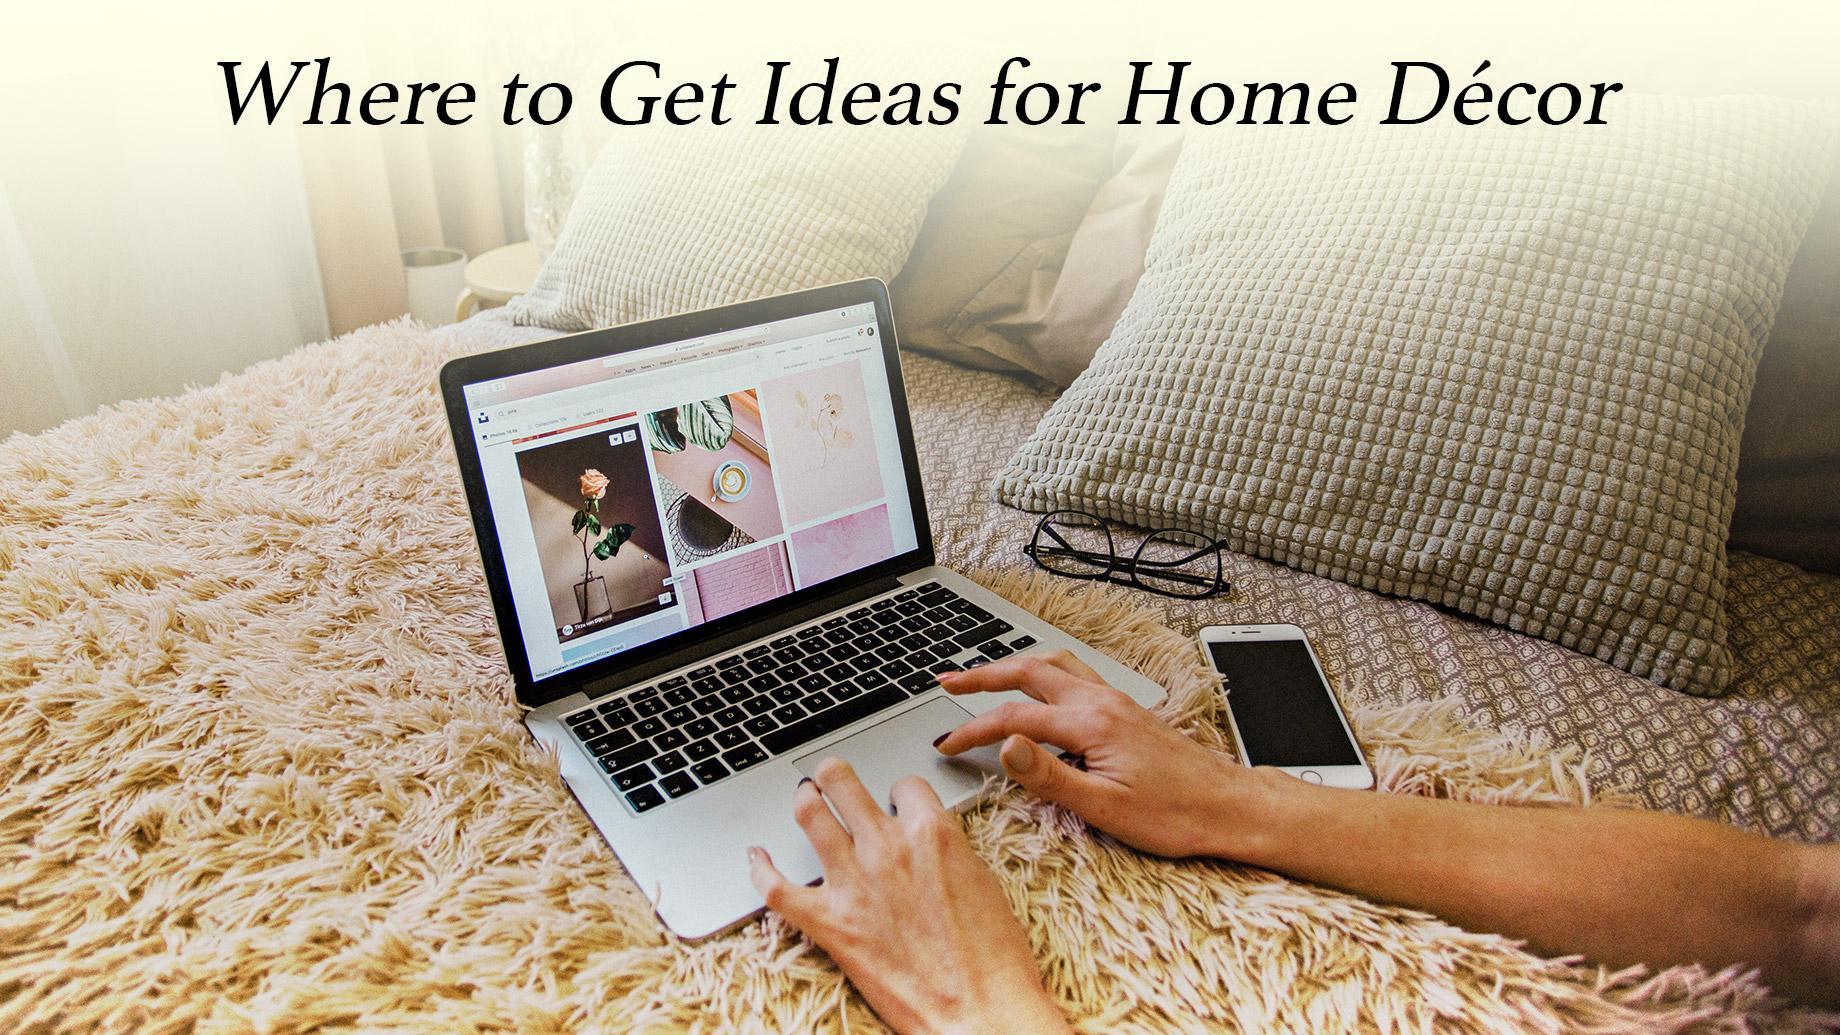 Where to Get Ideas for Home Décor